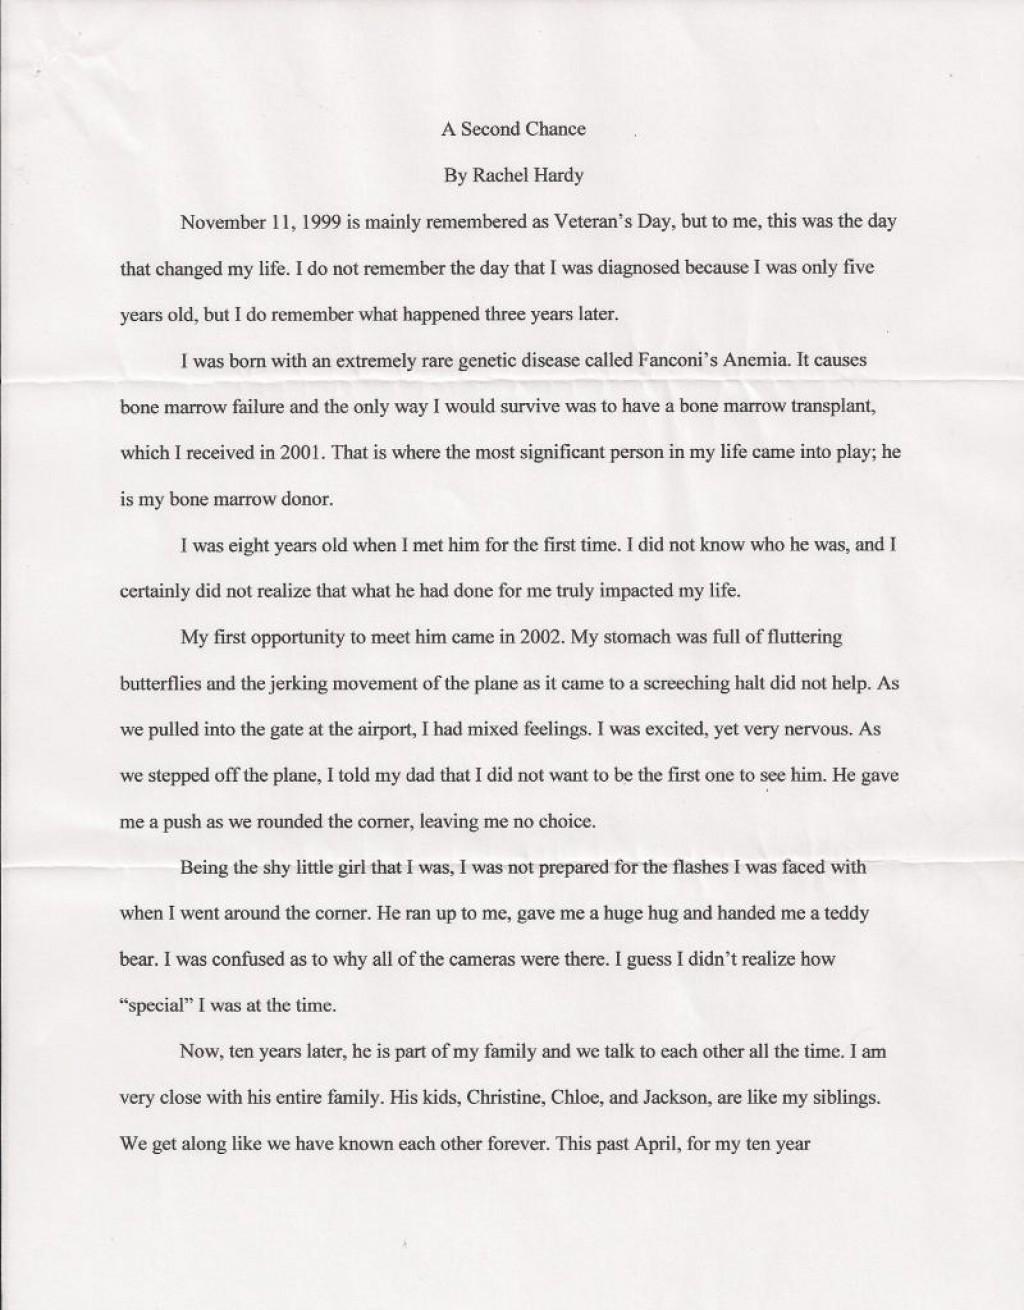 005 Essay Example College Scholarship Rachel Hardy 1 206151151 Std Best Topics List Template Tips Large